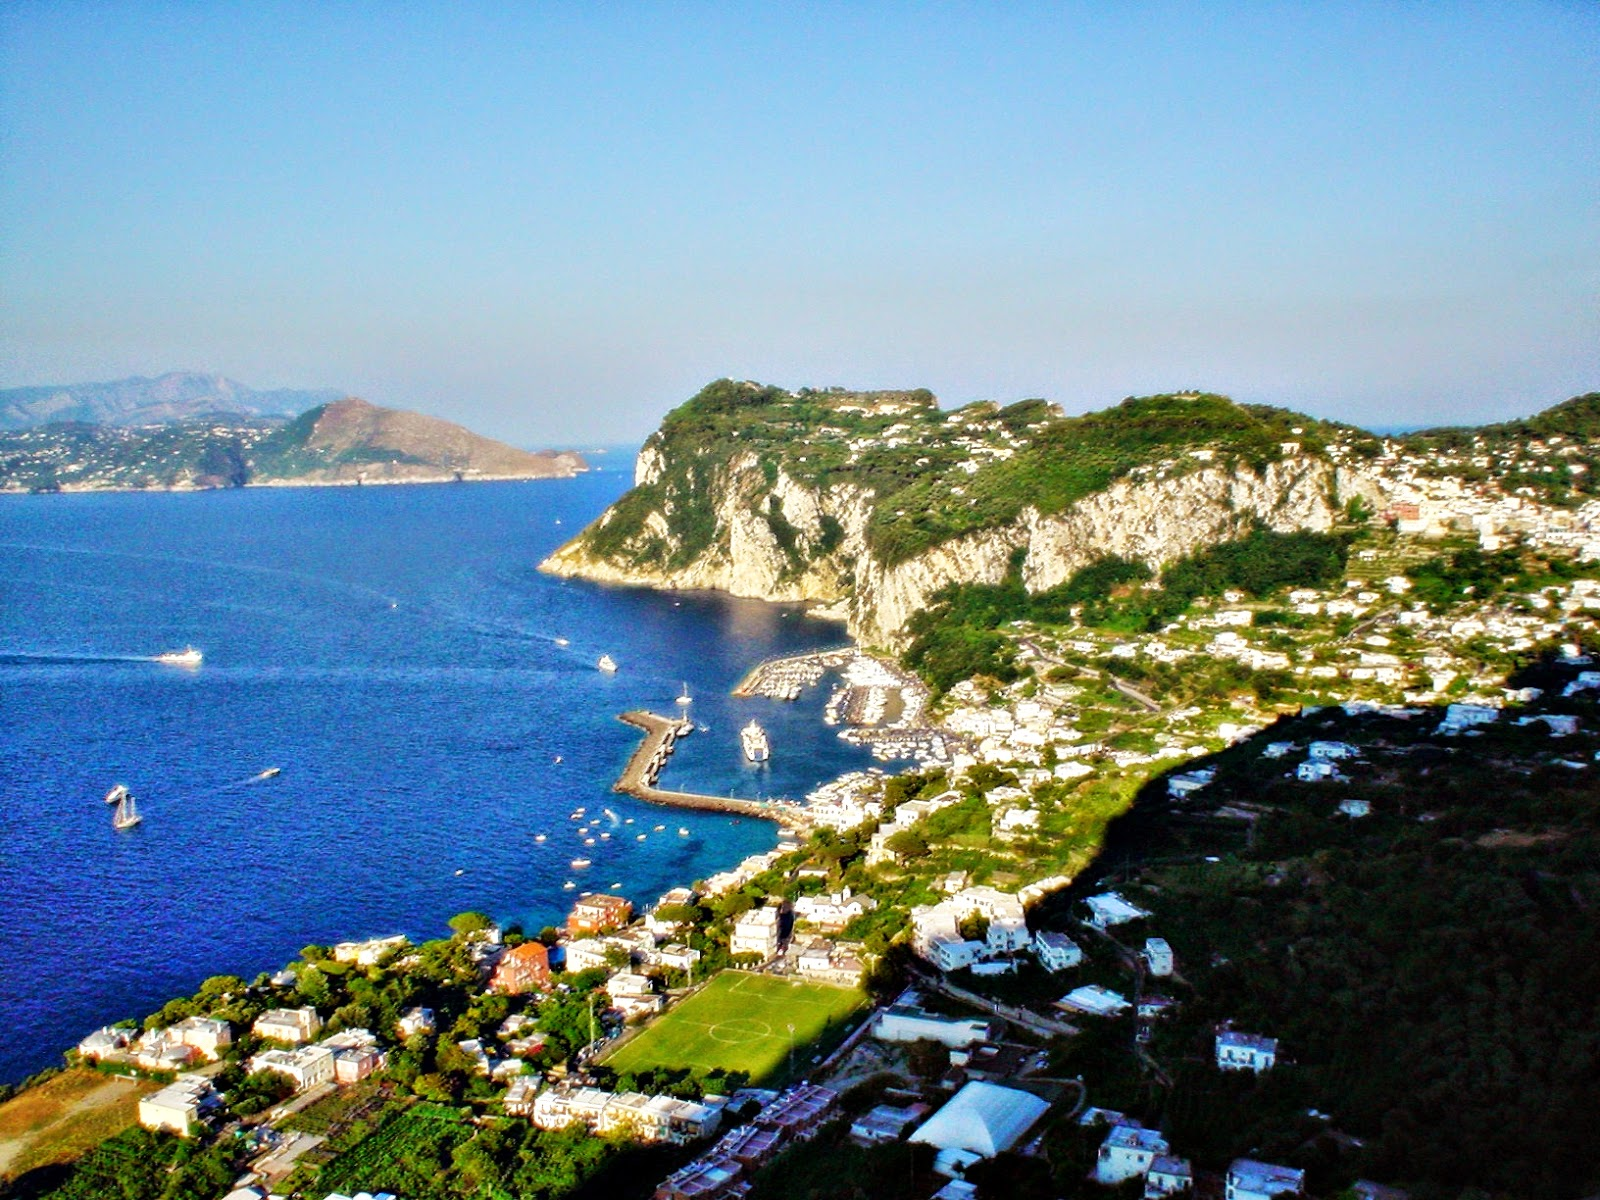 File:Isola di Capri.jpg